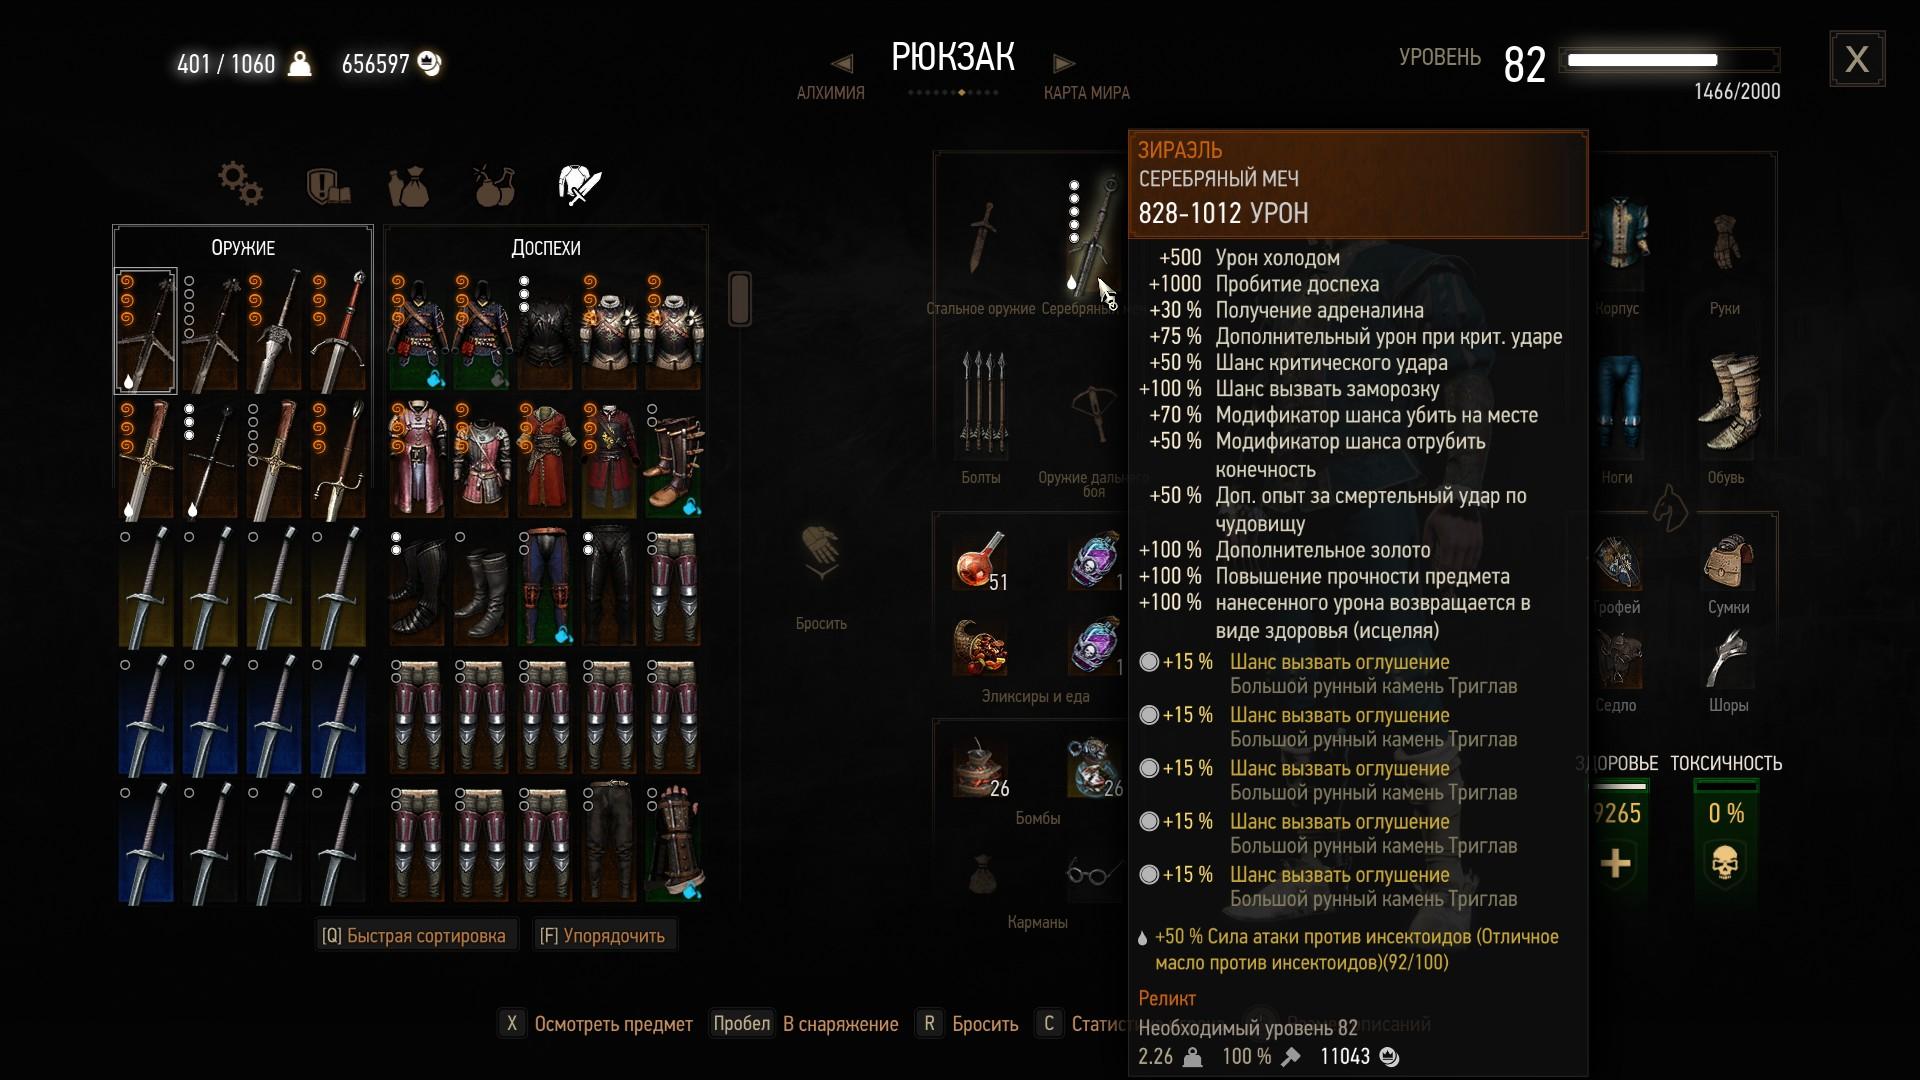 Зираэль.jpg - Witcher 3: Wild Hunt, the